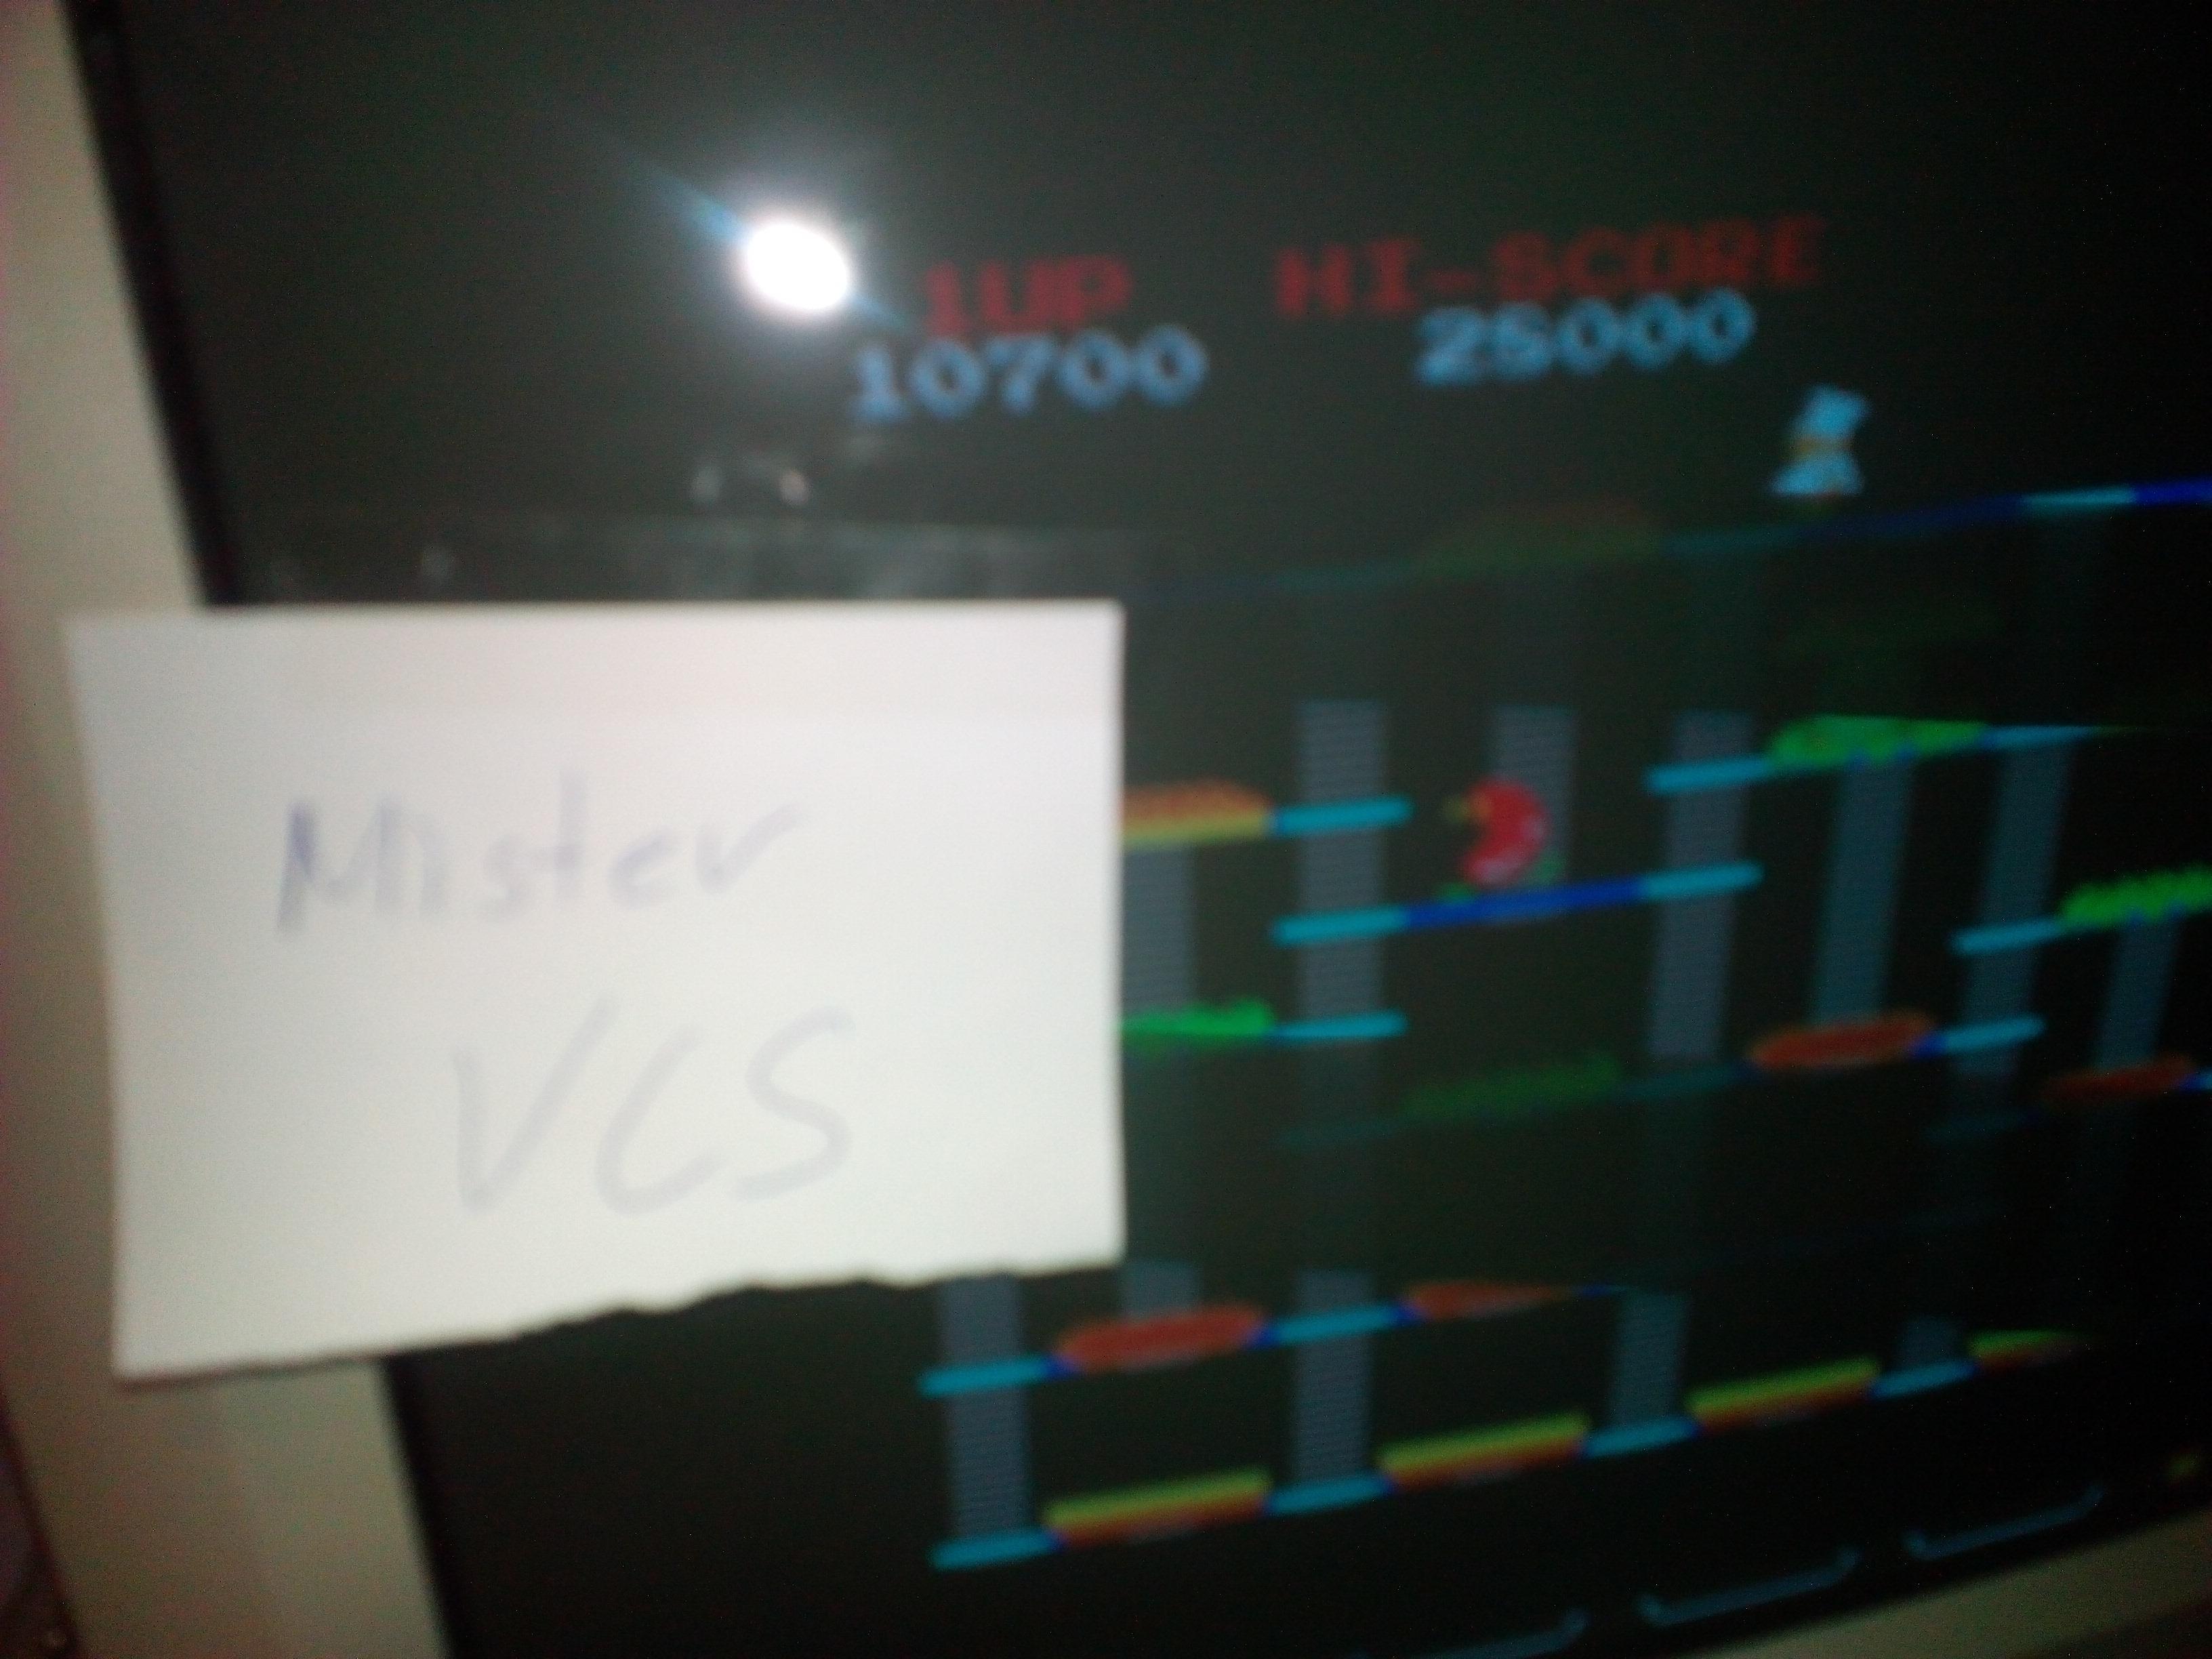 MisterVCS: BurgerTime (Arcade Emulated / M.A.M.E.) 10,700 points on 2018-09-14 15:09:45